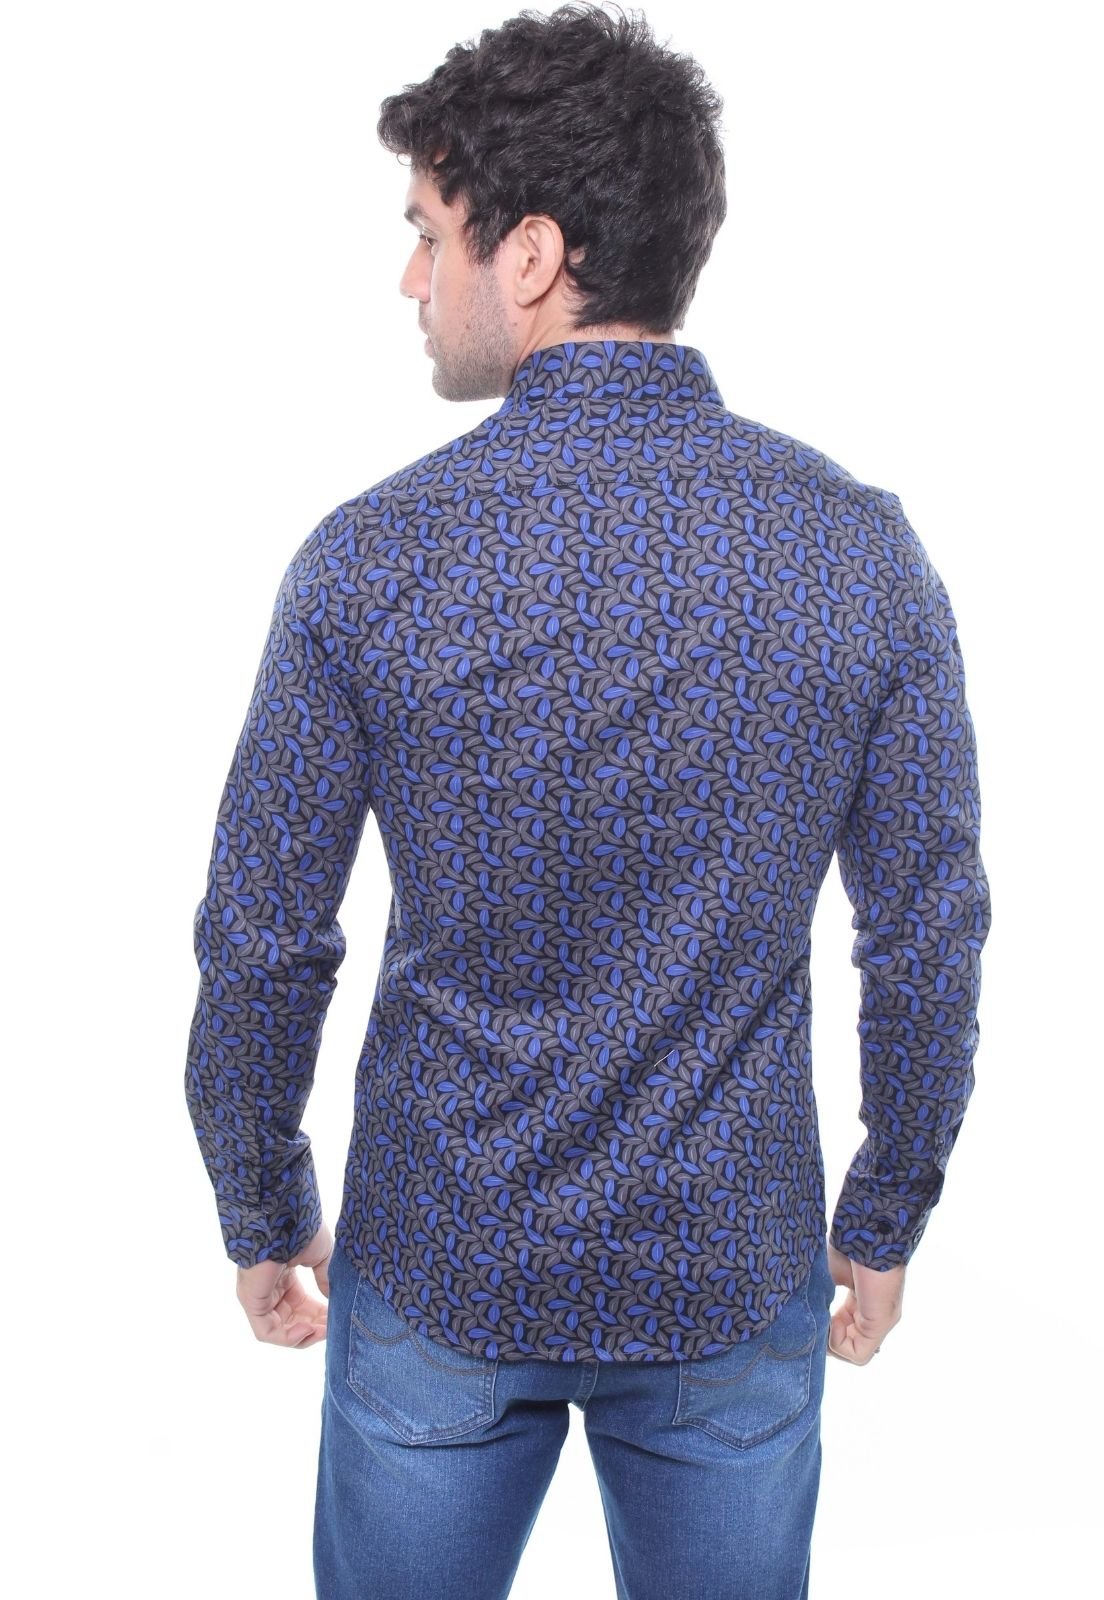 Kit 3 Camisas Masculina Manga Longa Crocker - 47156/47159/47160 Estampas Variadas  - CROCKER JEANS